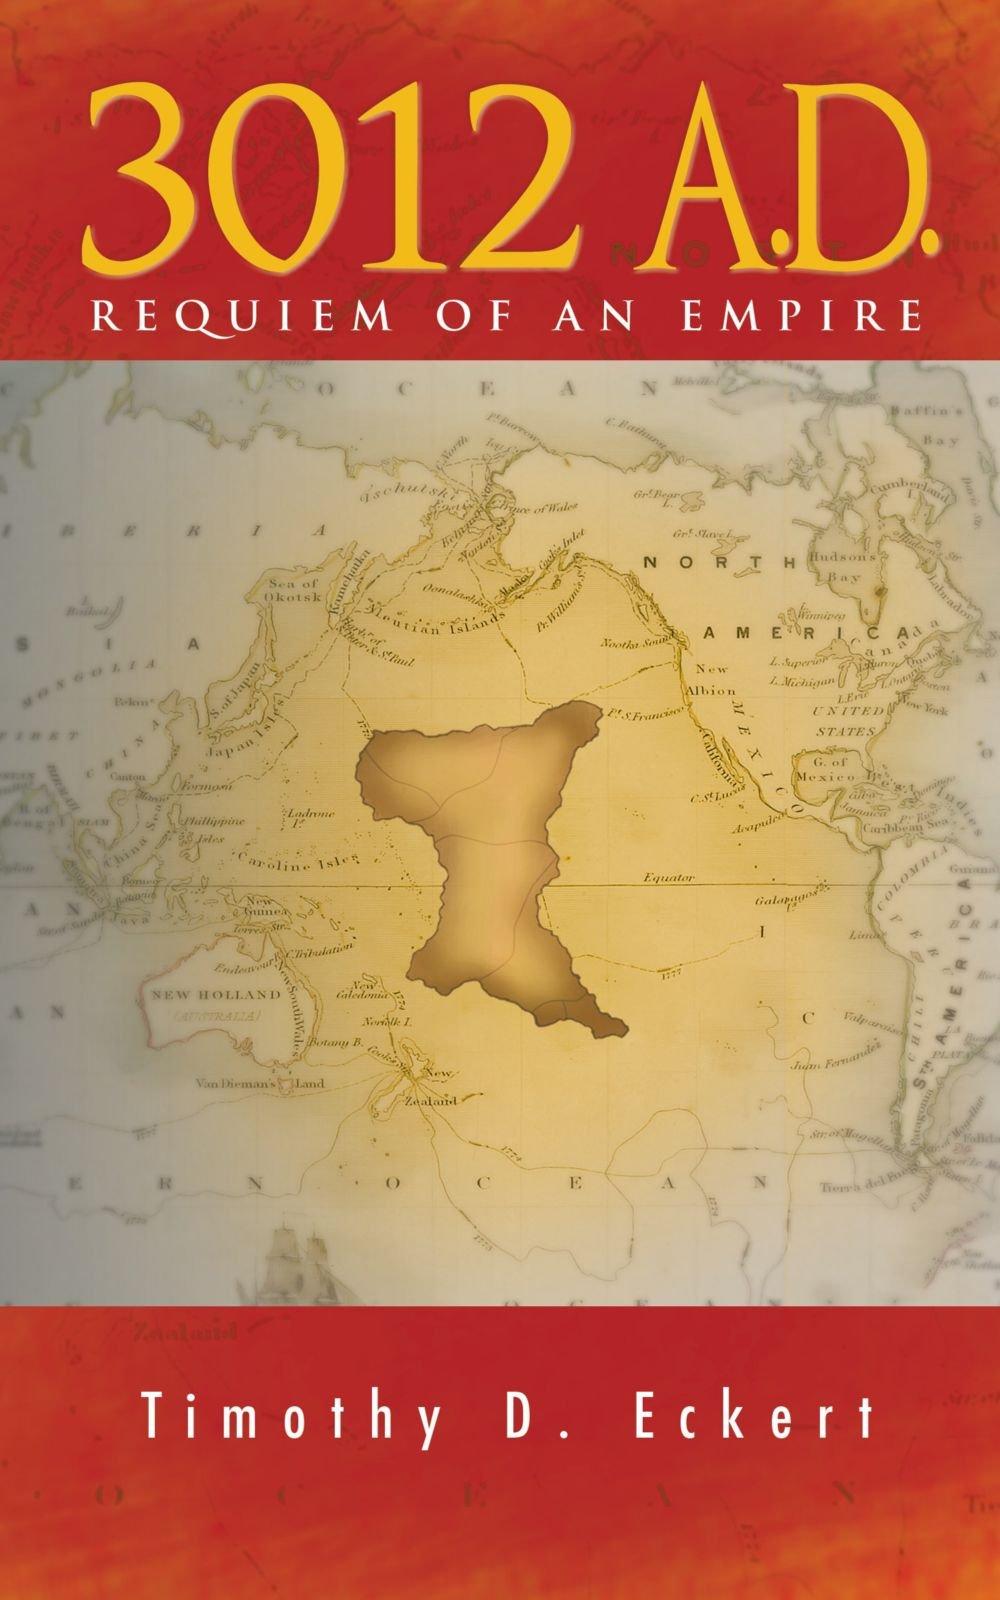 3012 A.D.: Requiem Of An Empire PDF